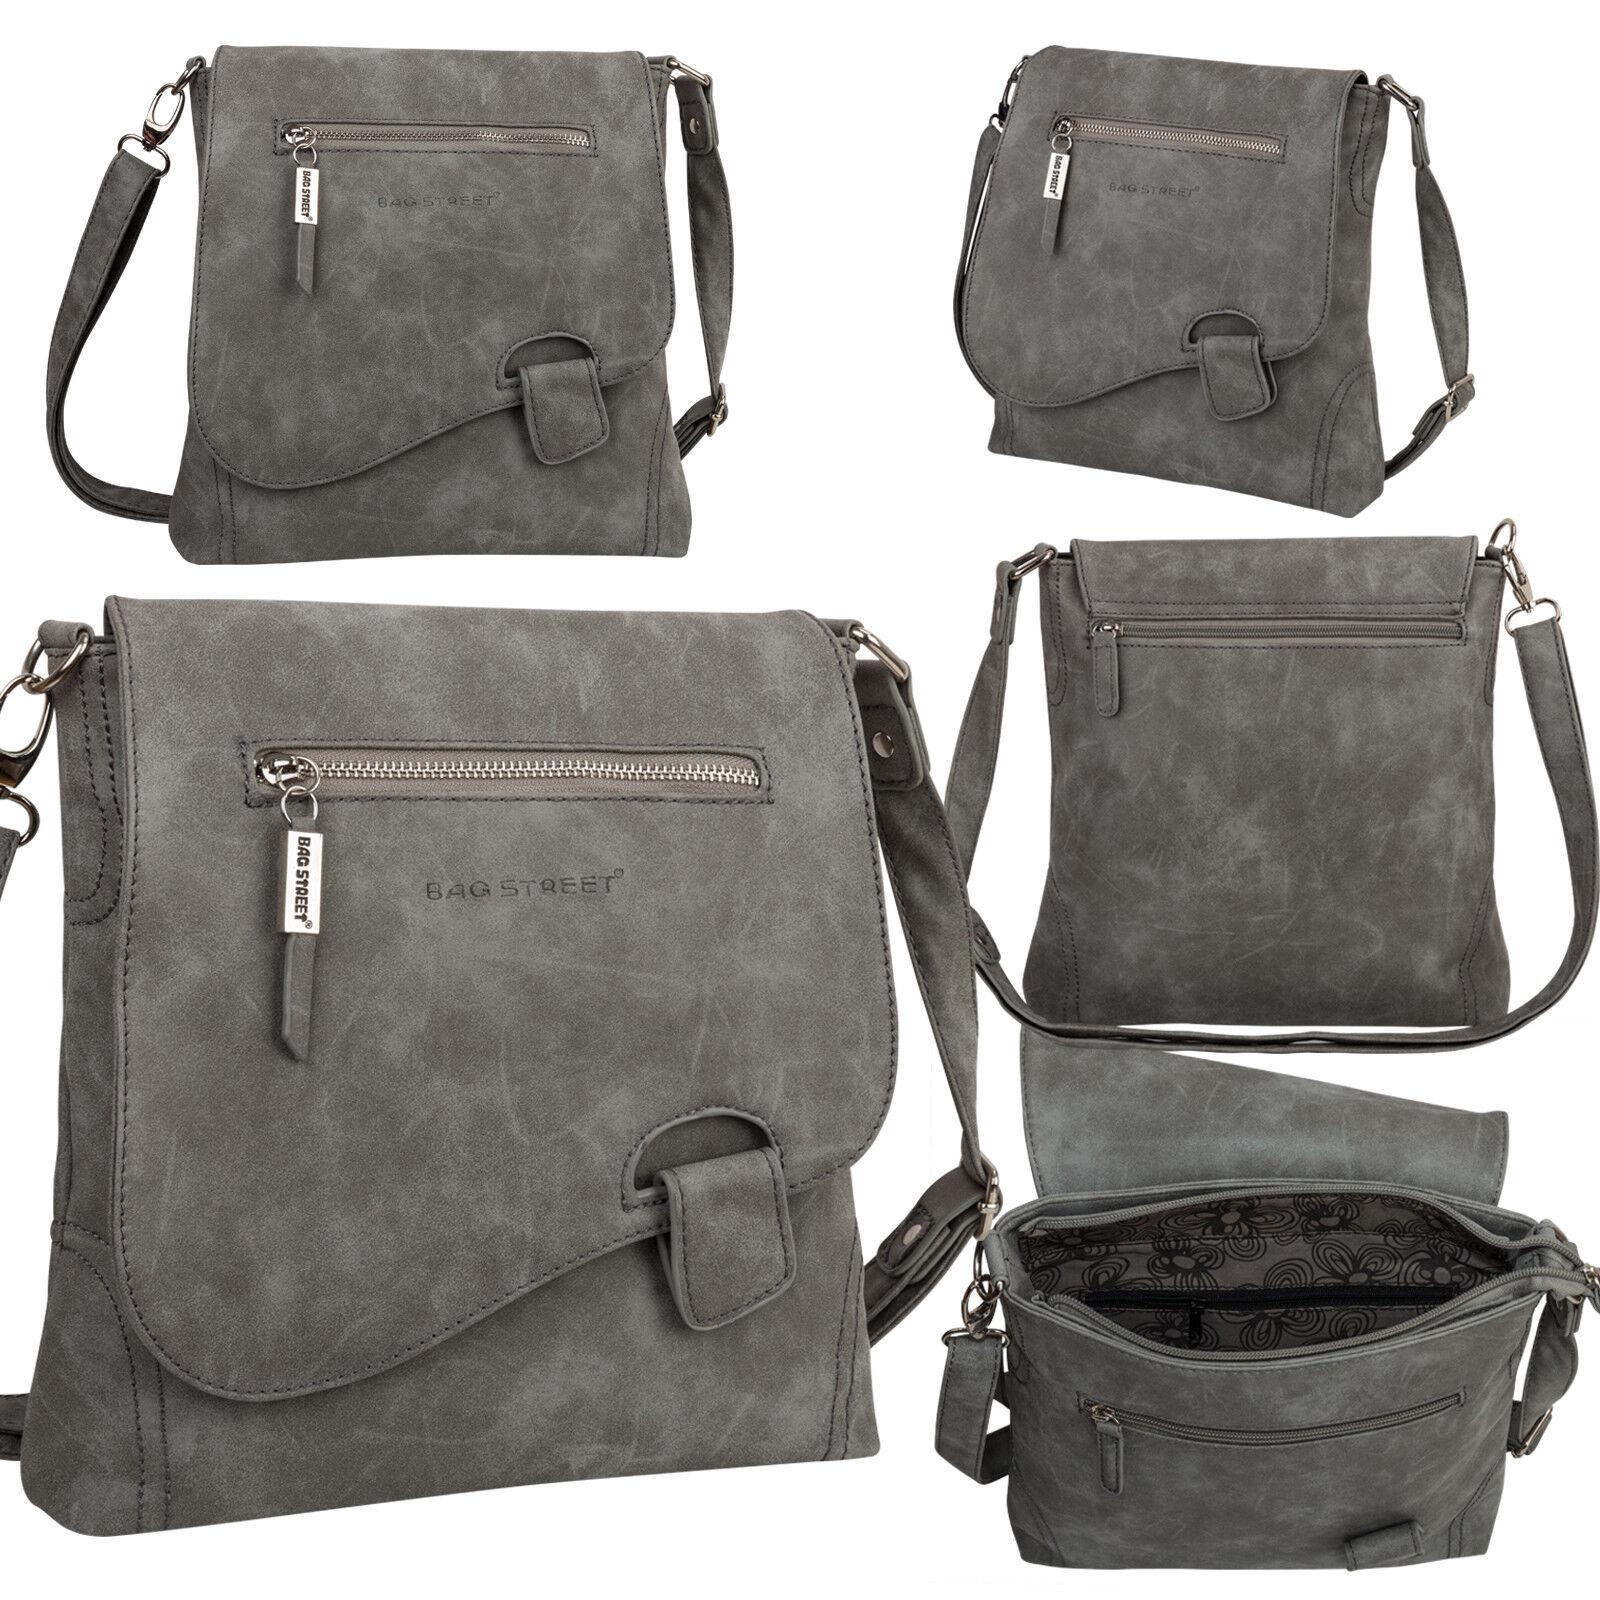 Bag Street Damentasche Umhängetasche Handtasche Schultertasche K2 T0104 Grau